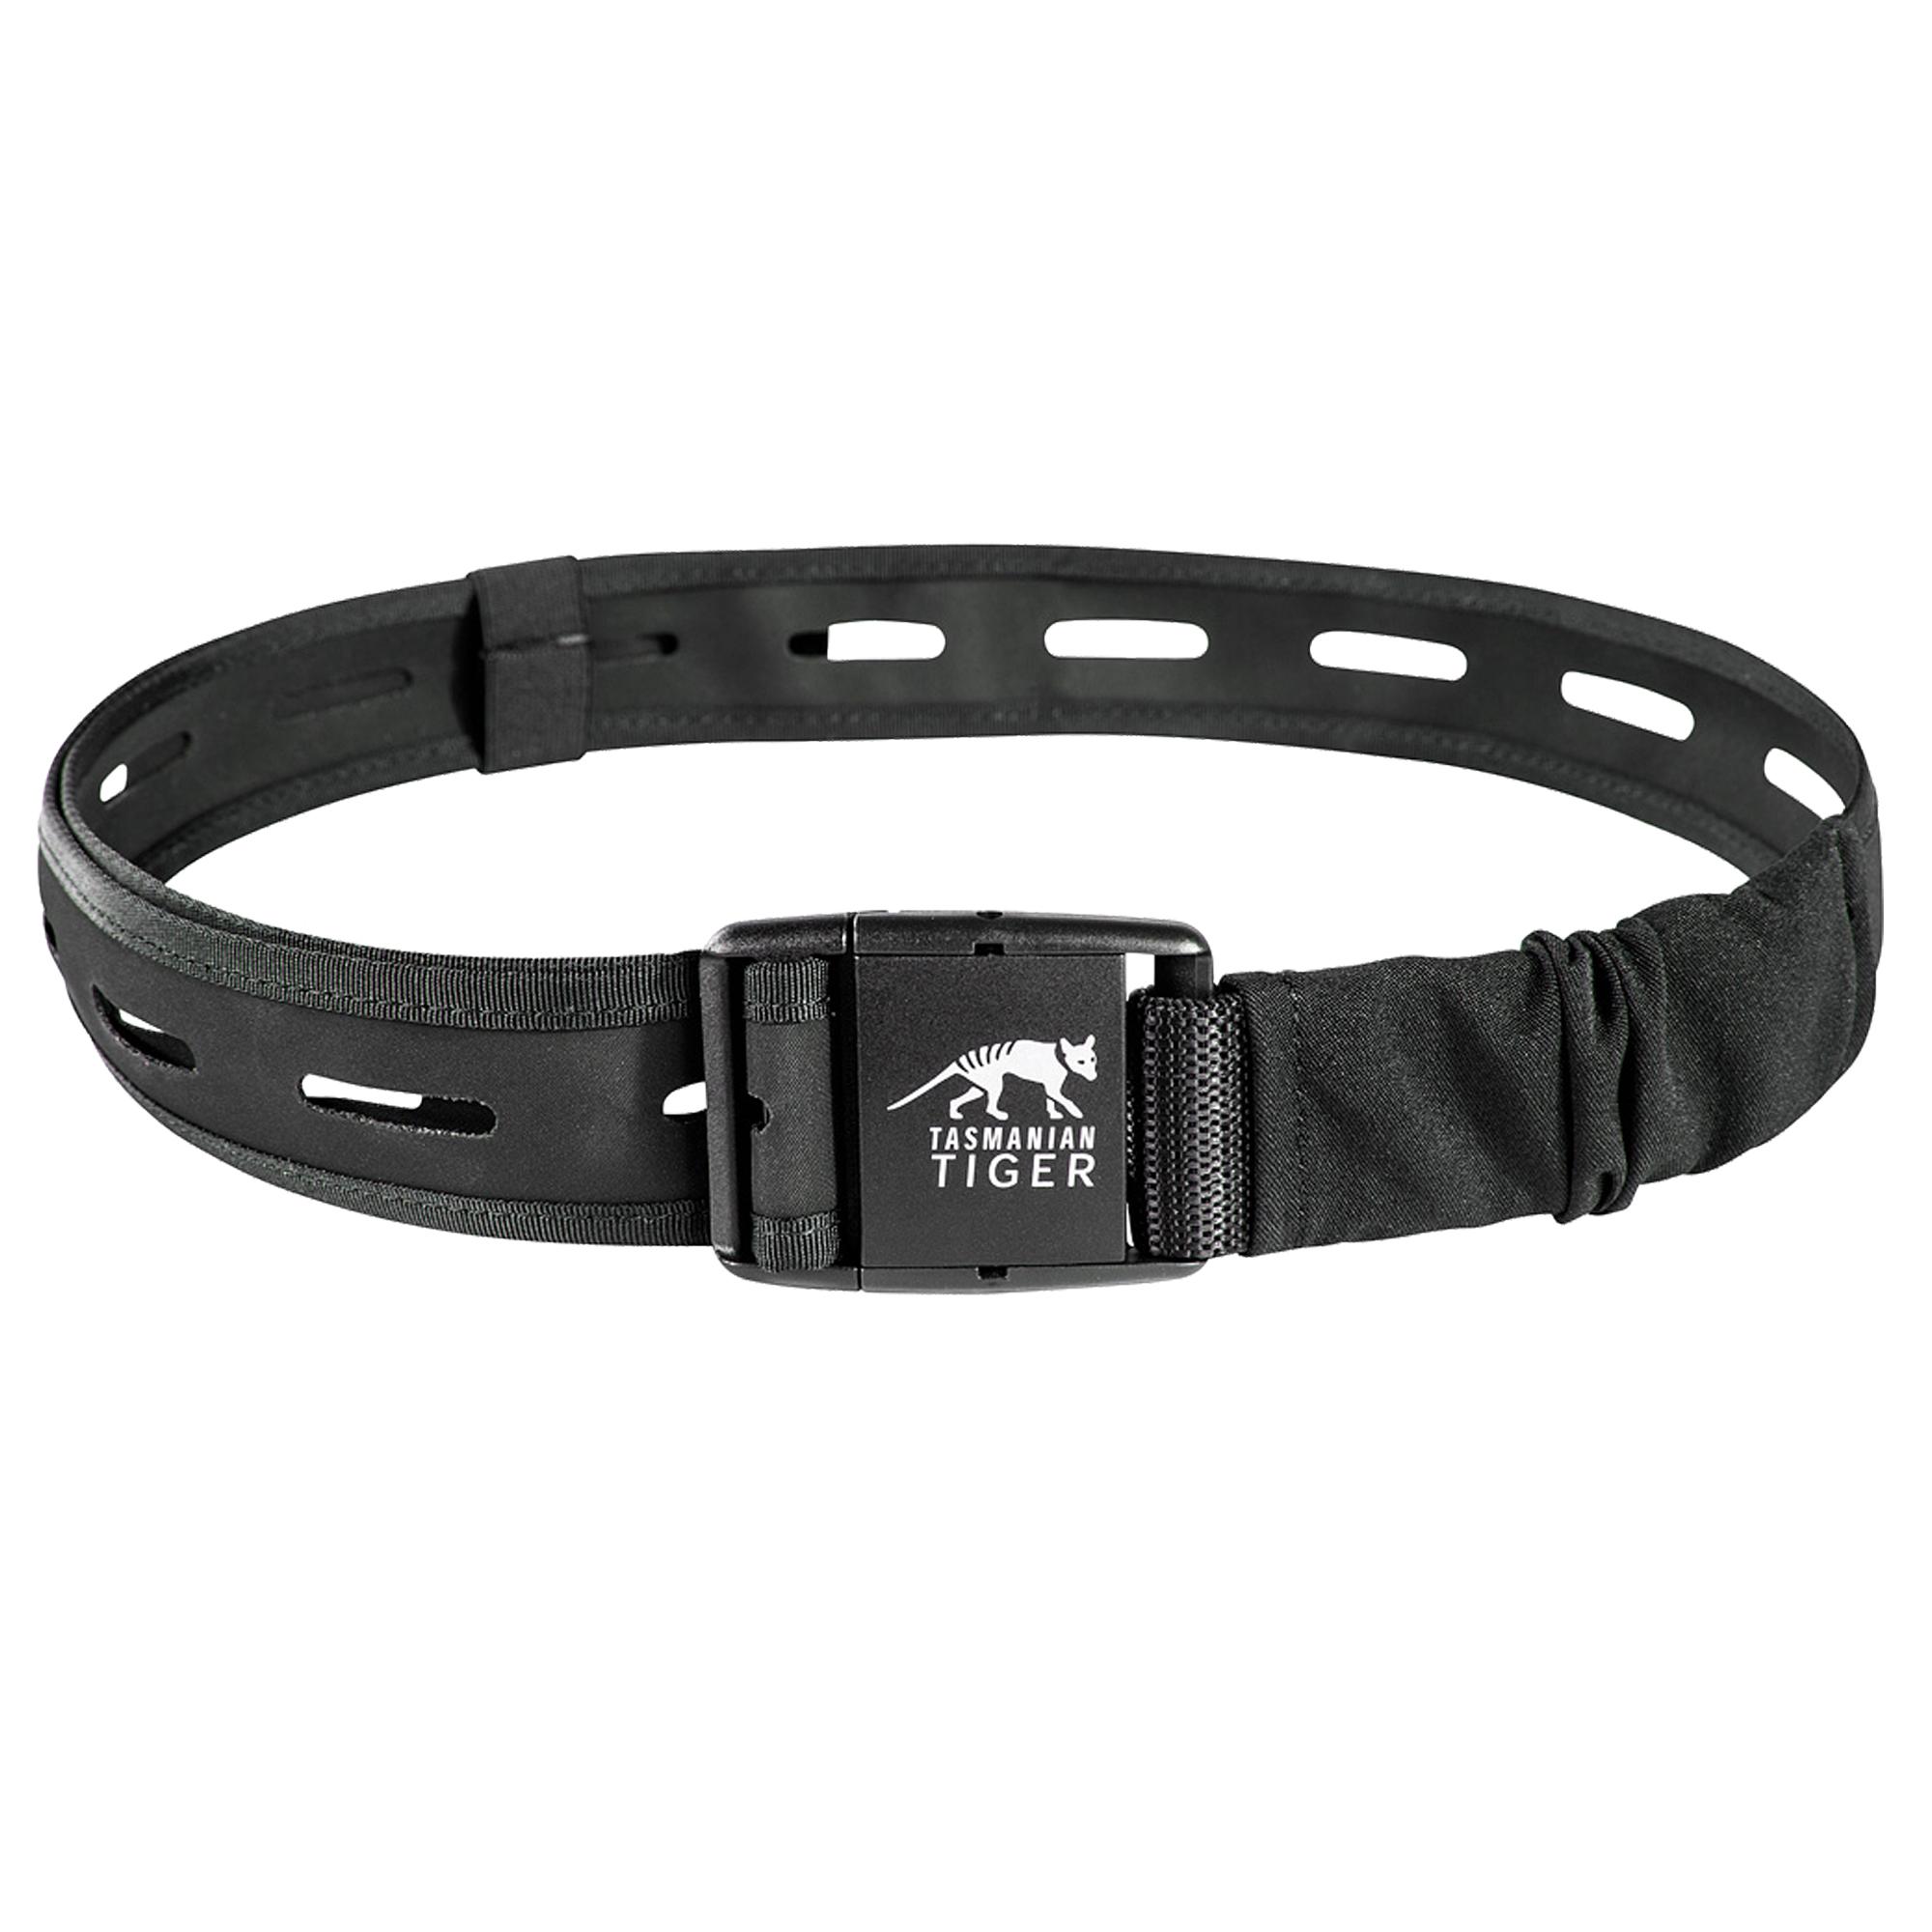 Tasmanian Tiger Gürtel HYP Belt 40 schwarz